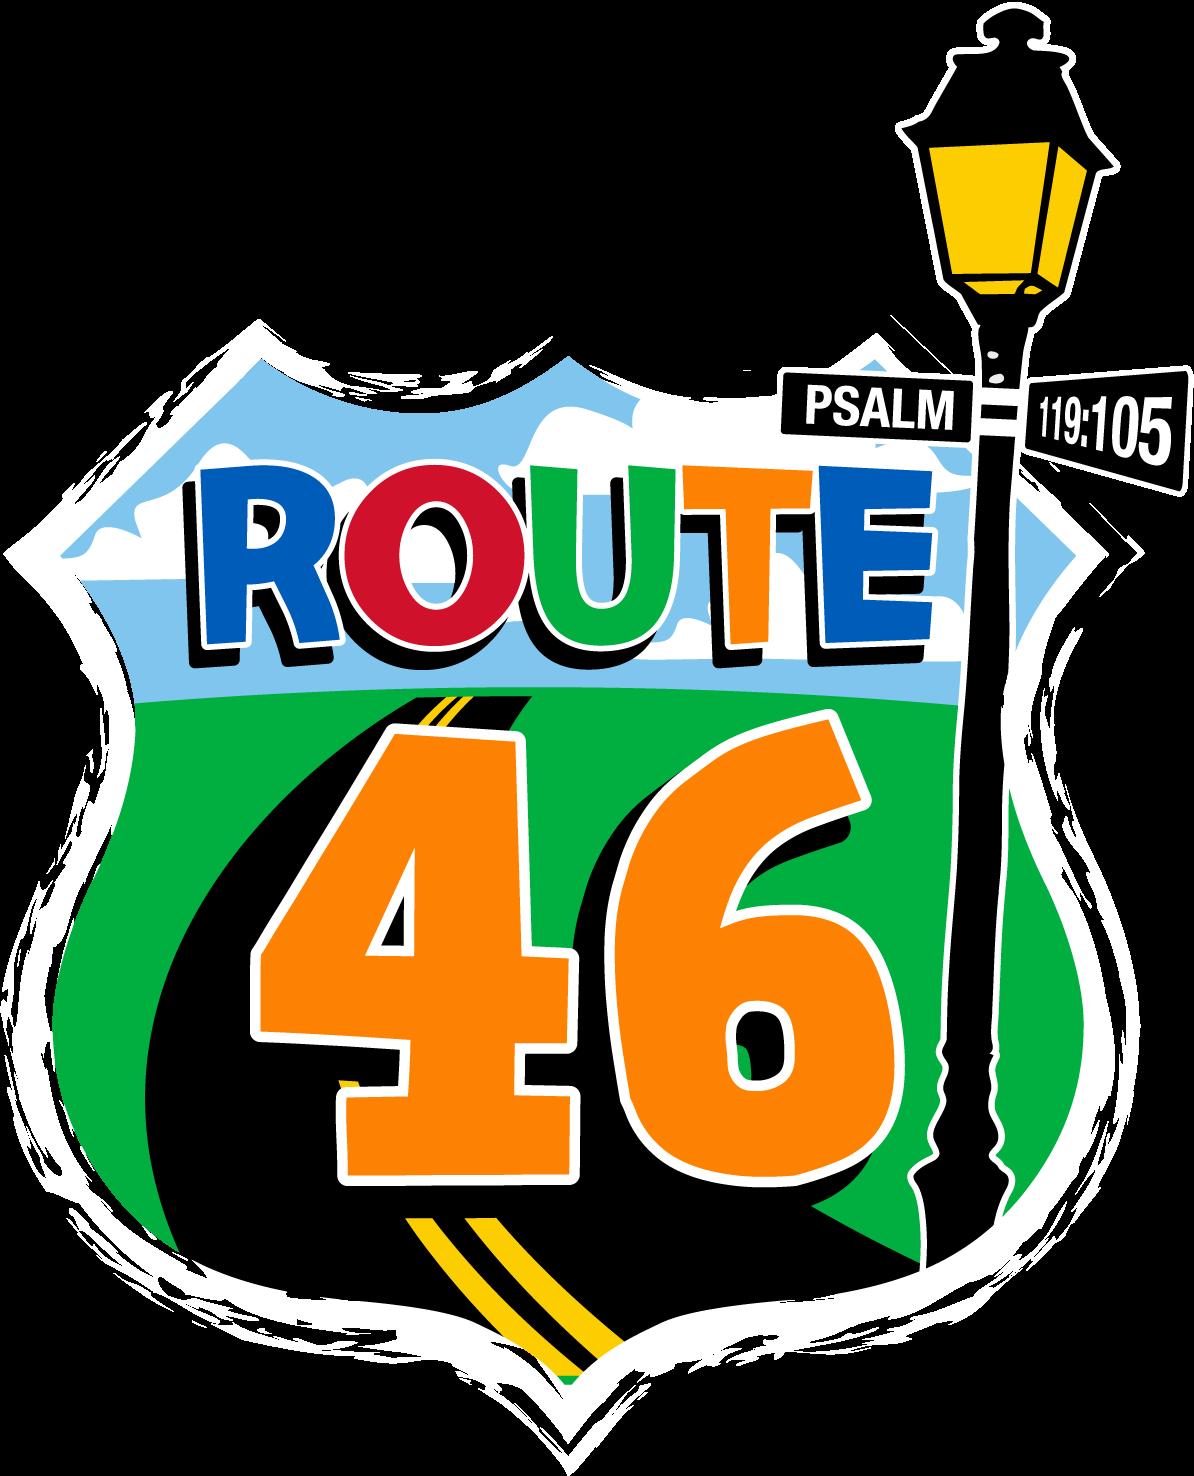 ROUTE-46-COLOR.png